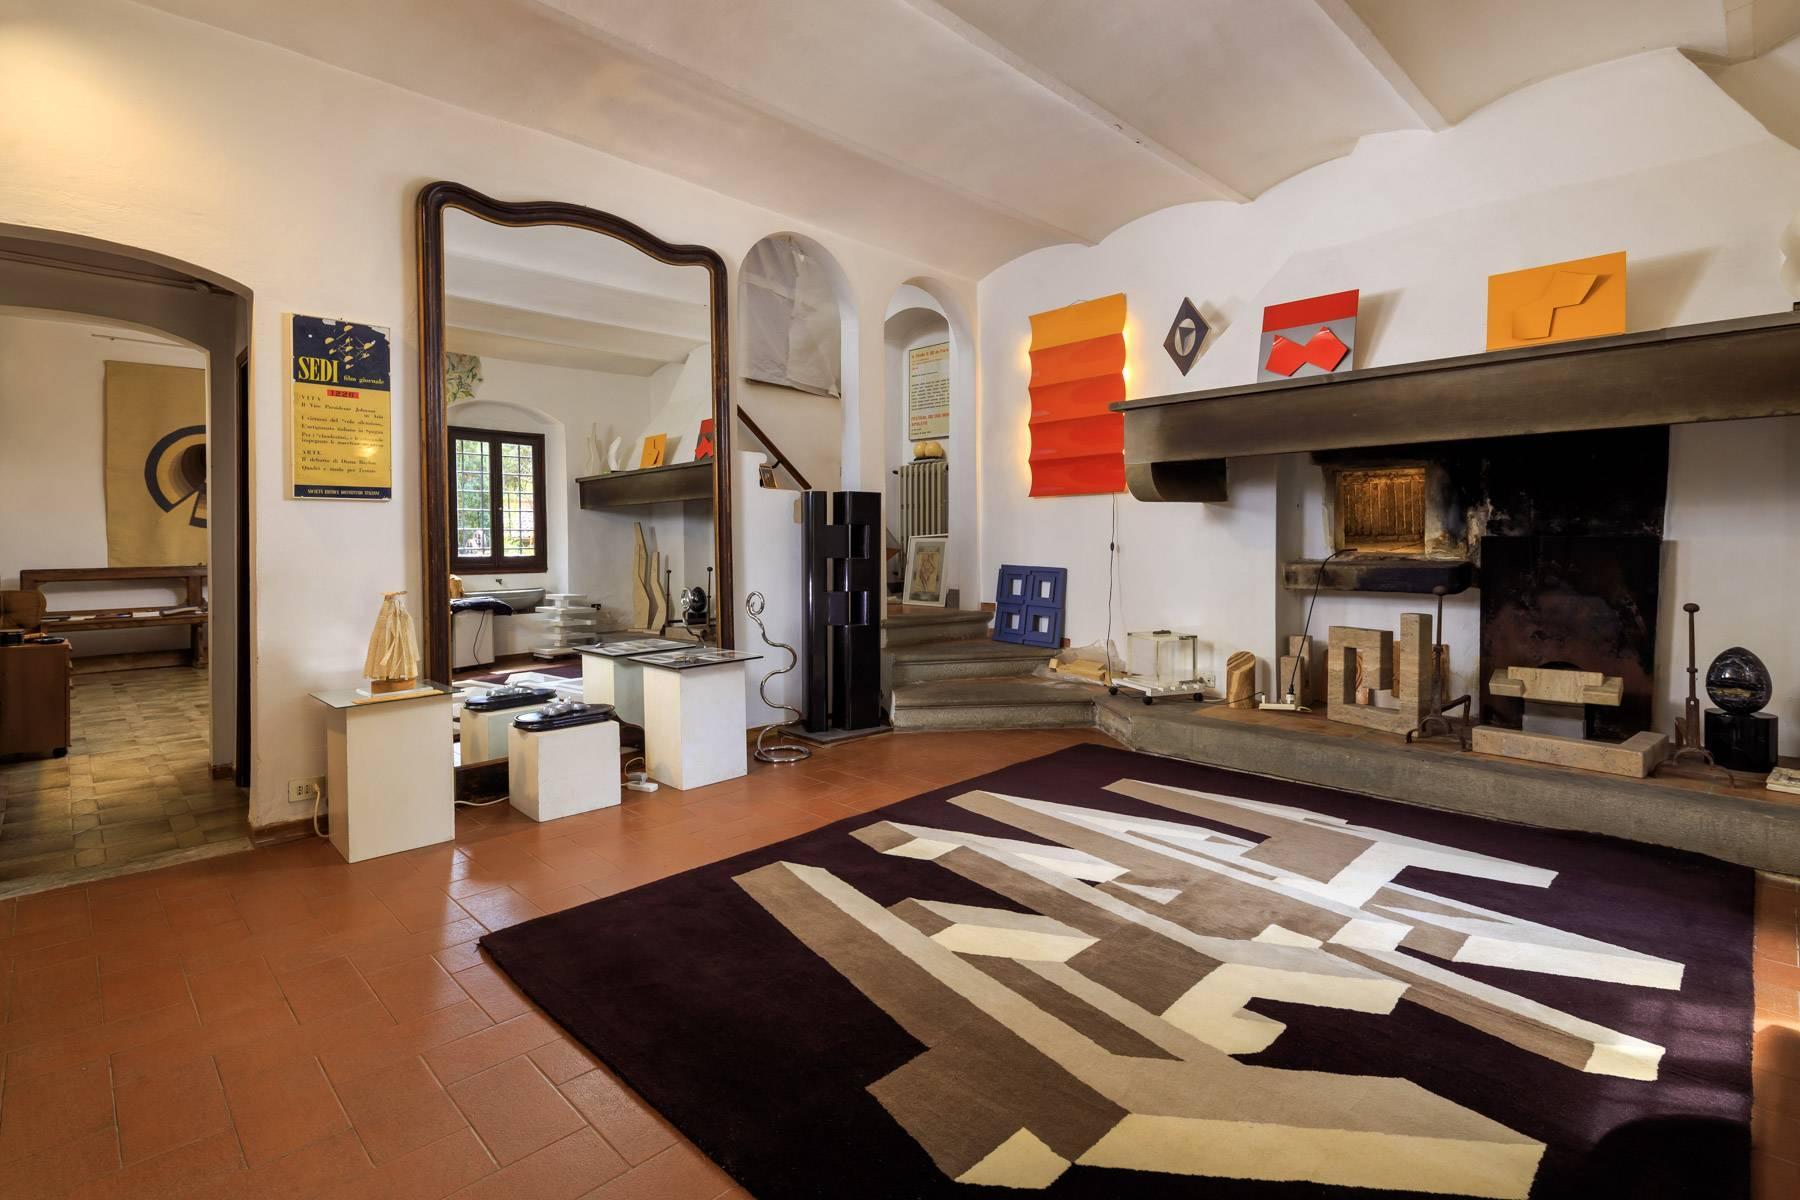 Diana Baylons Haus-Museum - 10